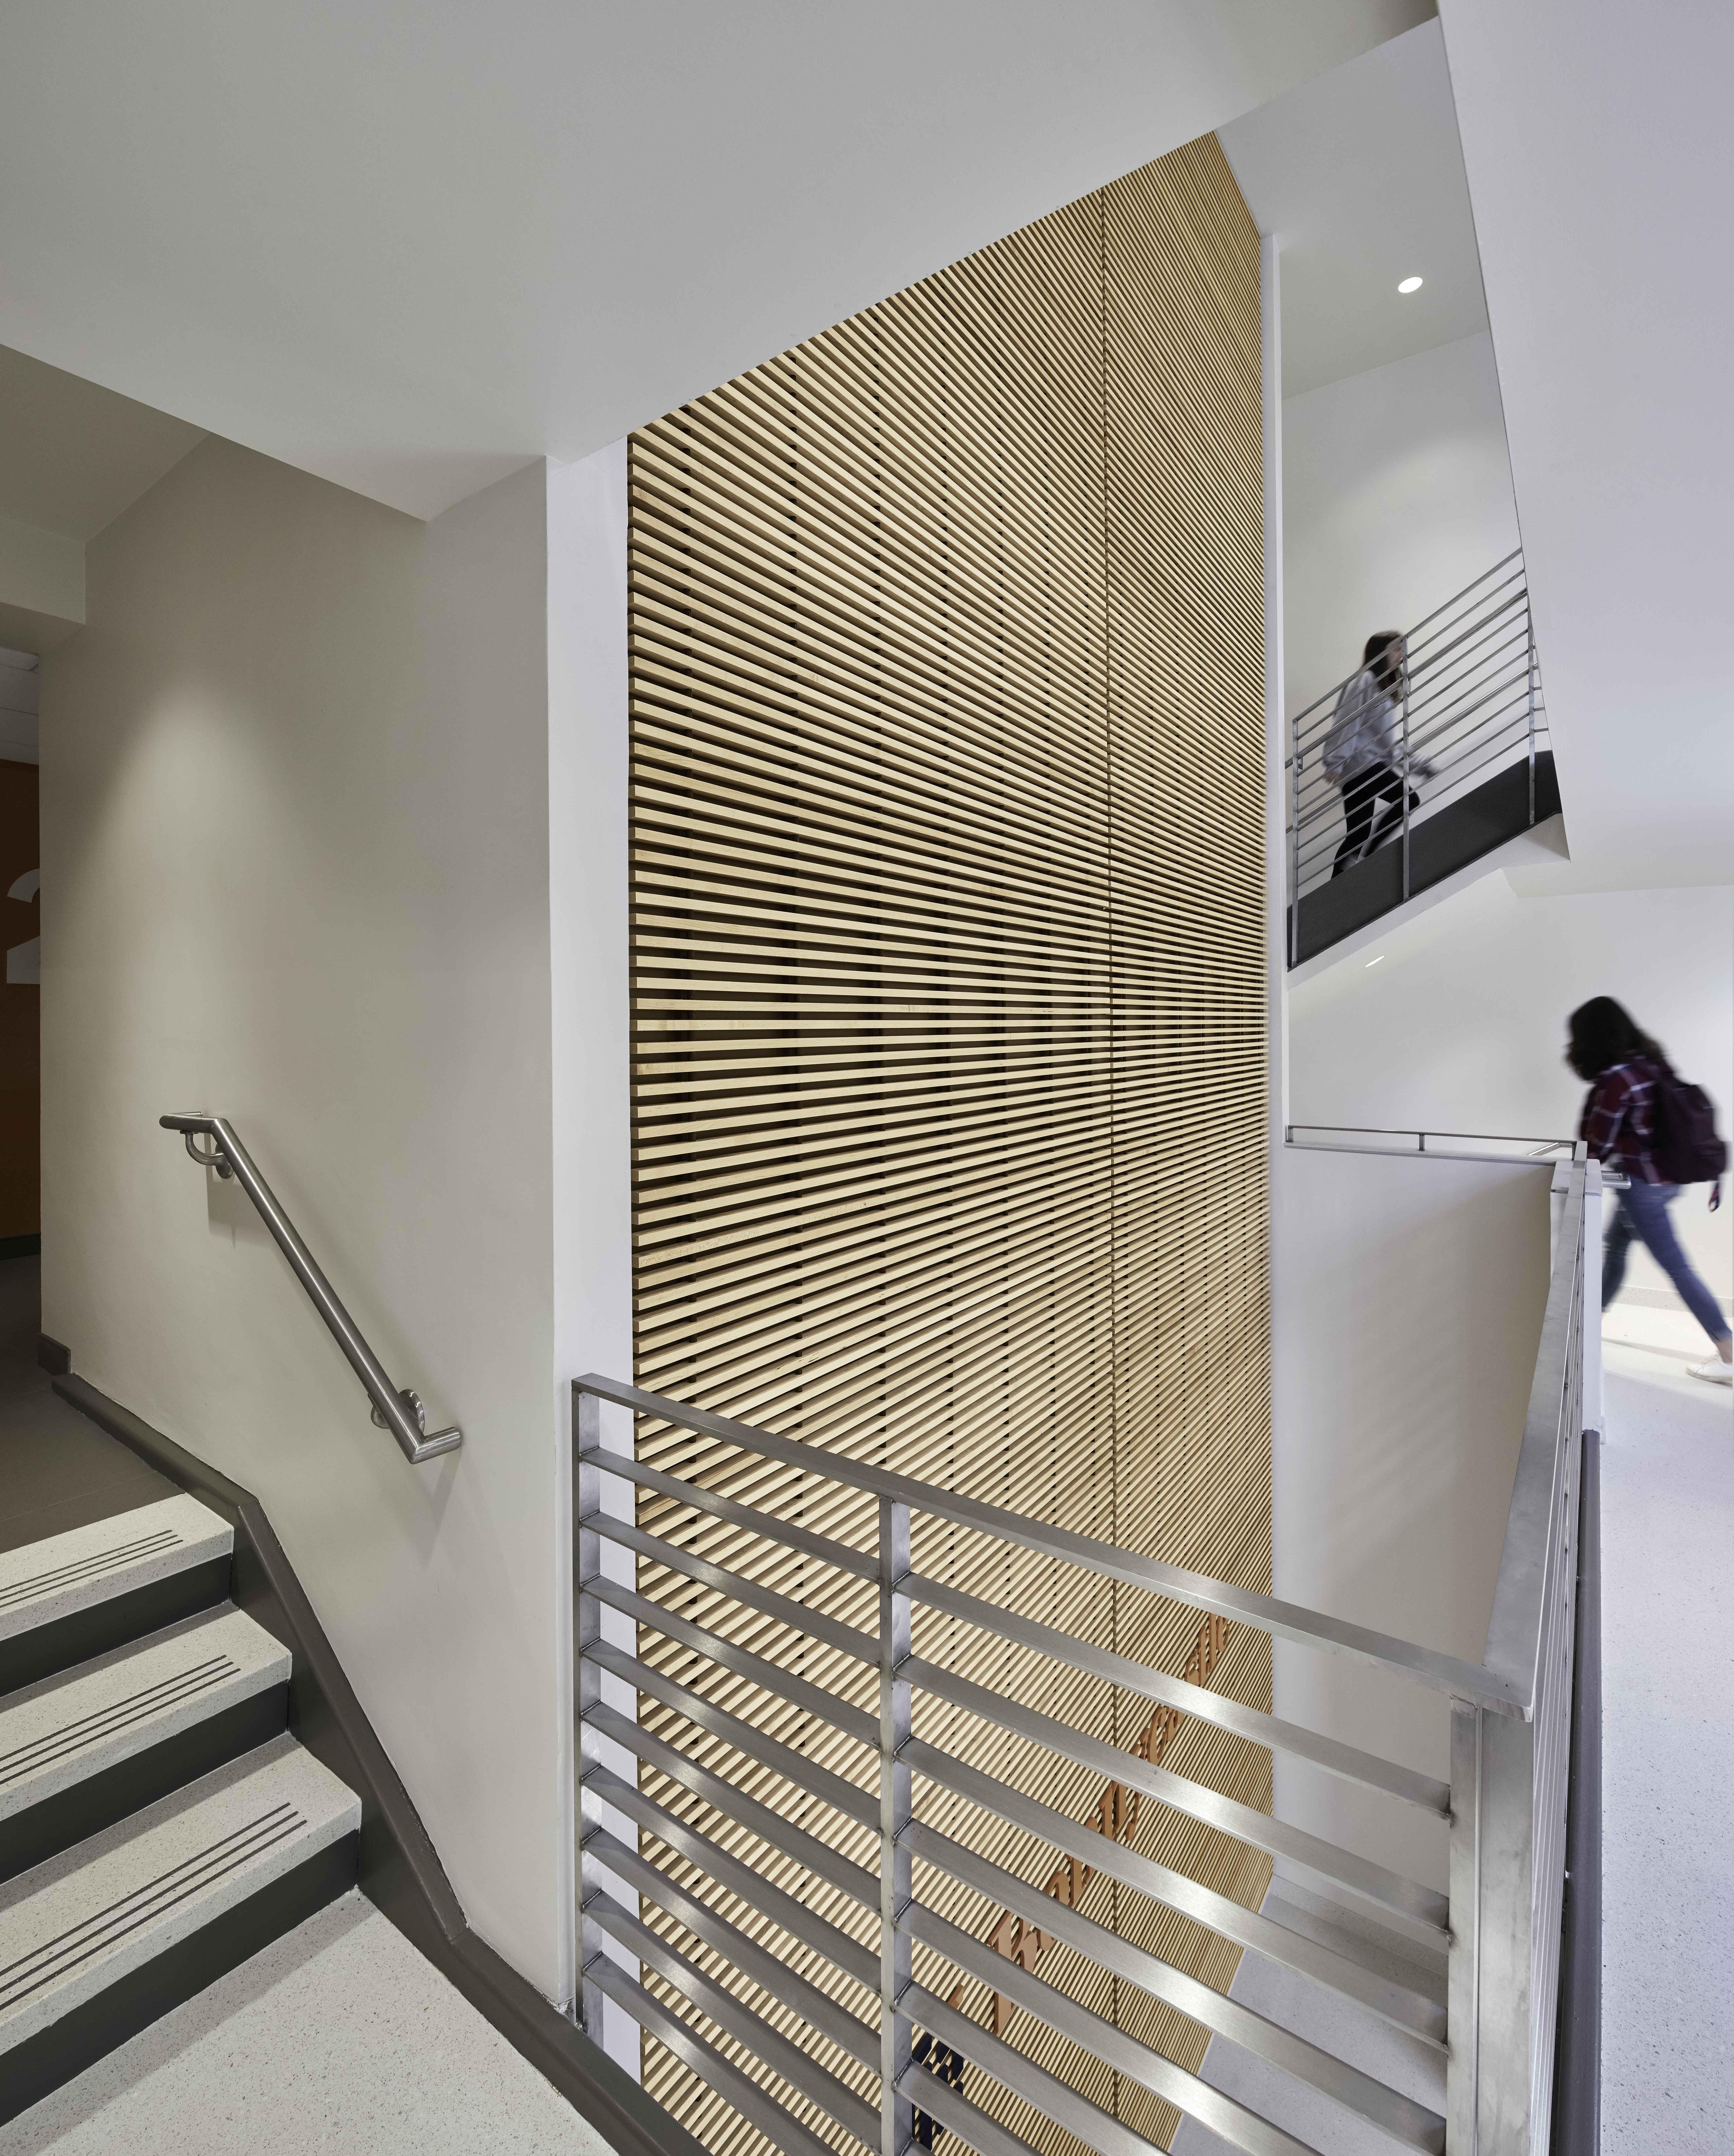 UVA McCormick Bonnycastle lobby and stairwell